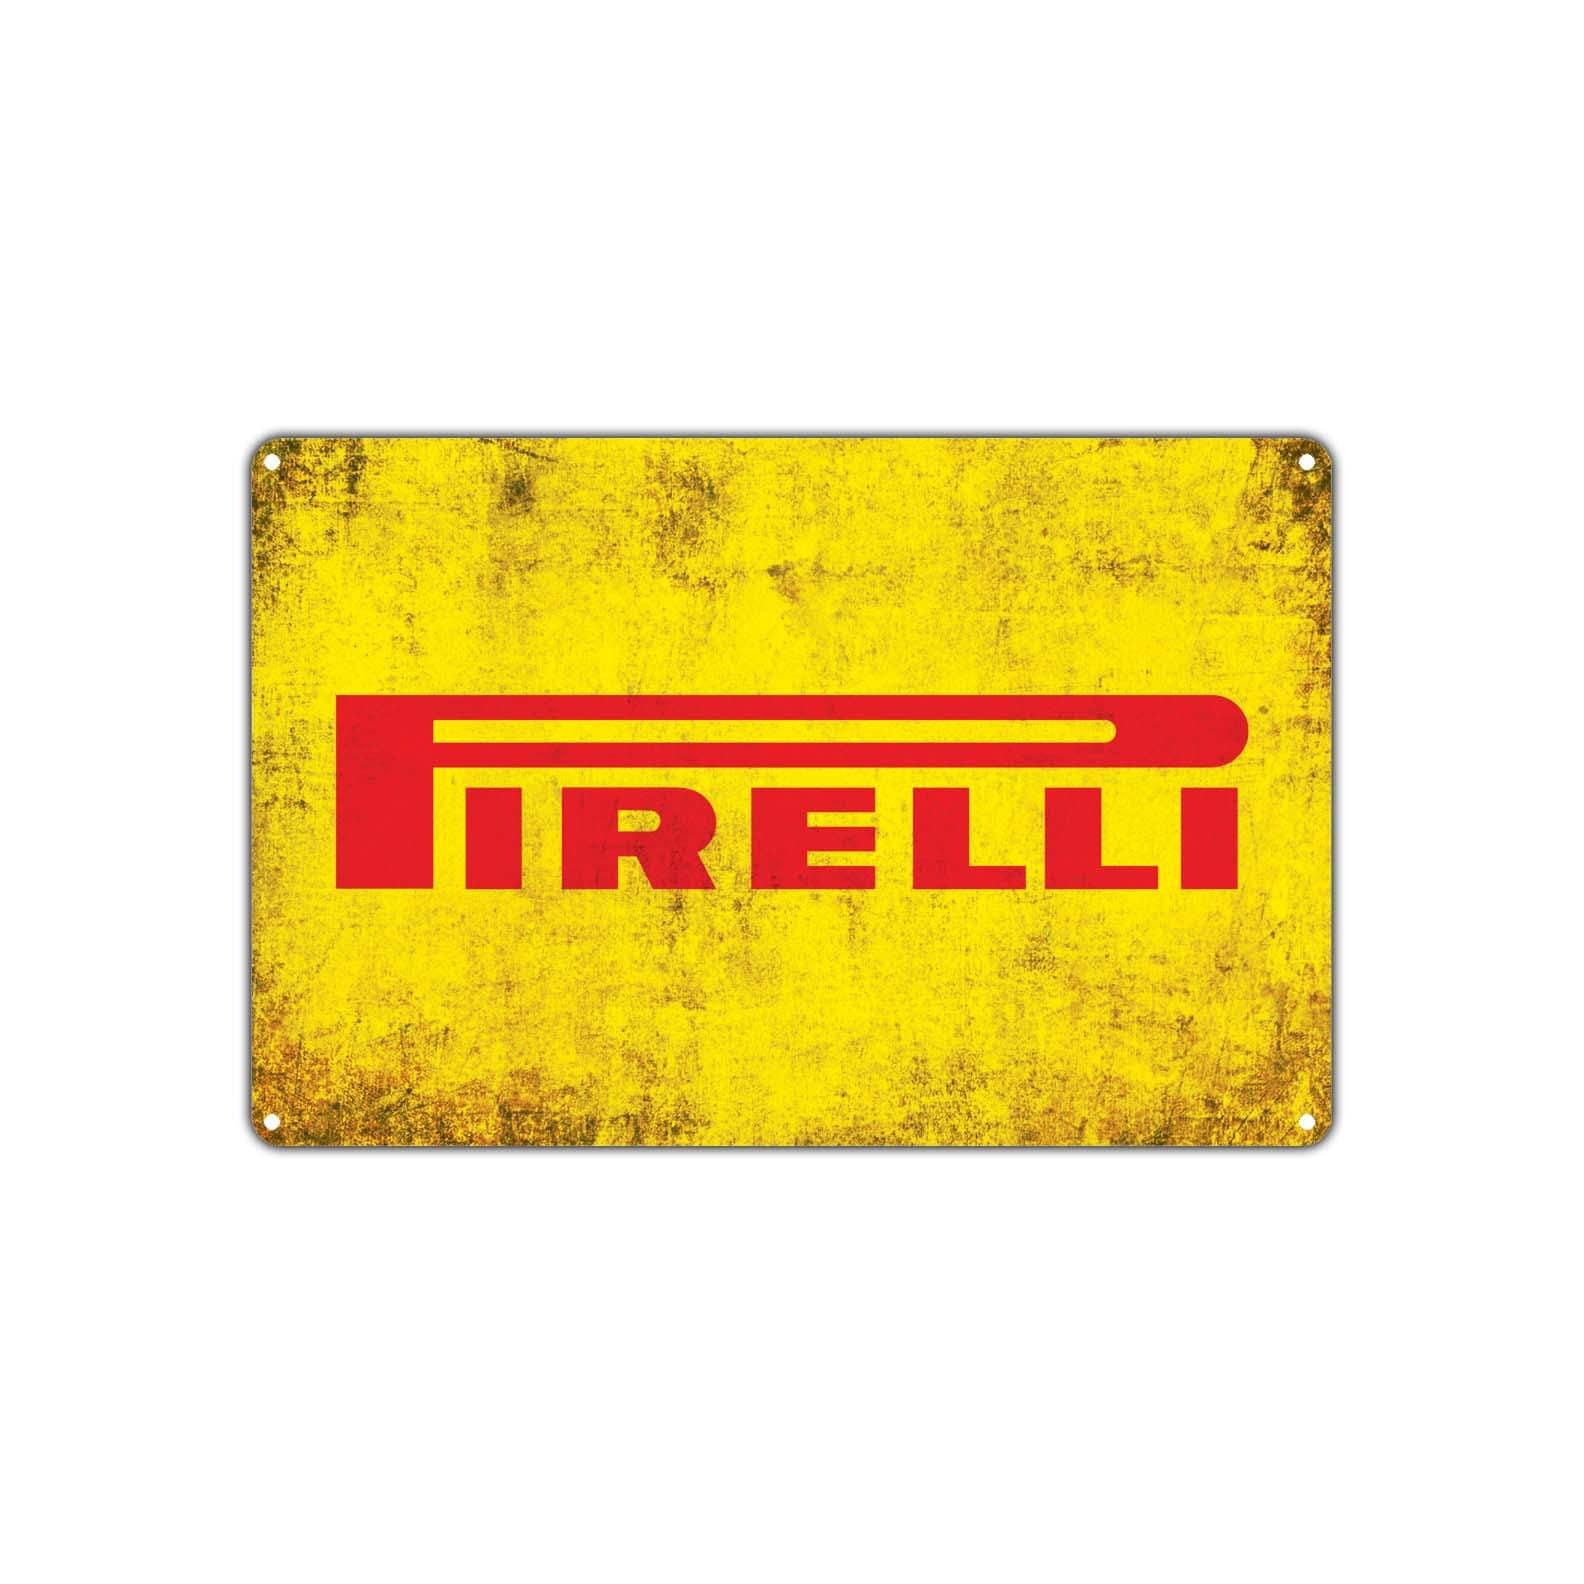 Pirelli Tires Retro Vintage Sign Decor Wall Art Auto Shop